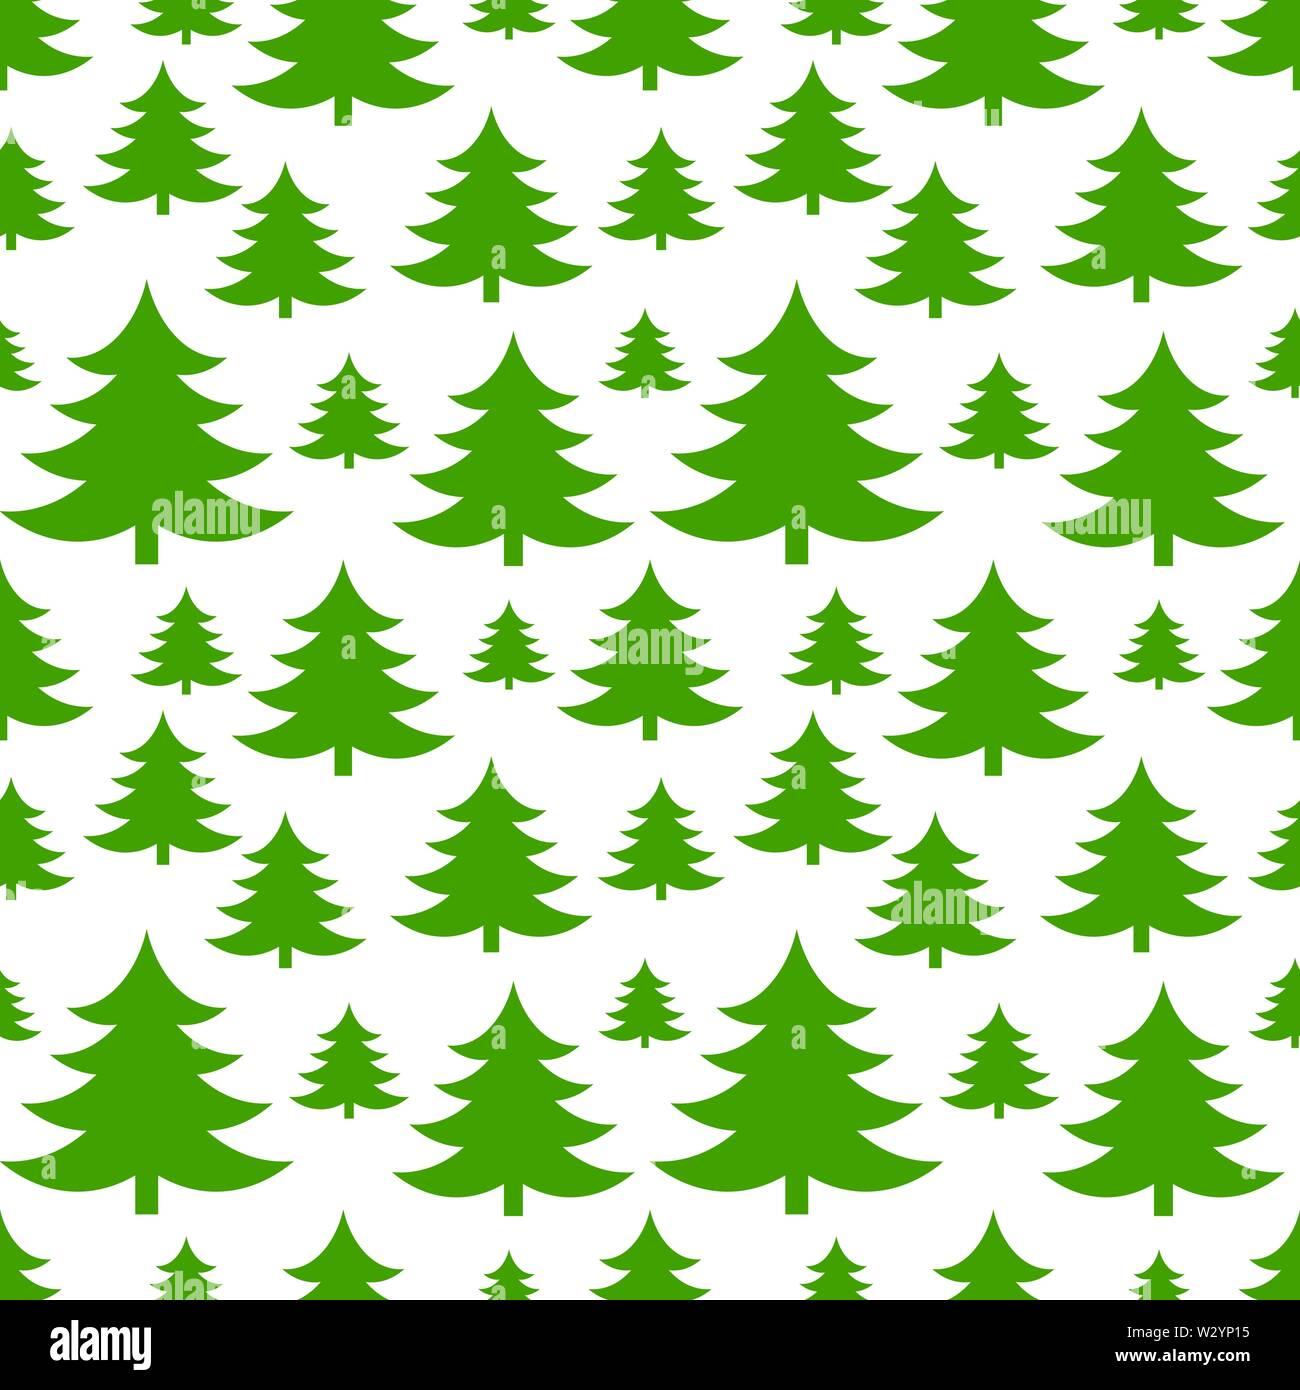 Christmas trees green seamless pattern.Vector illustration - Stock Image